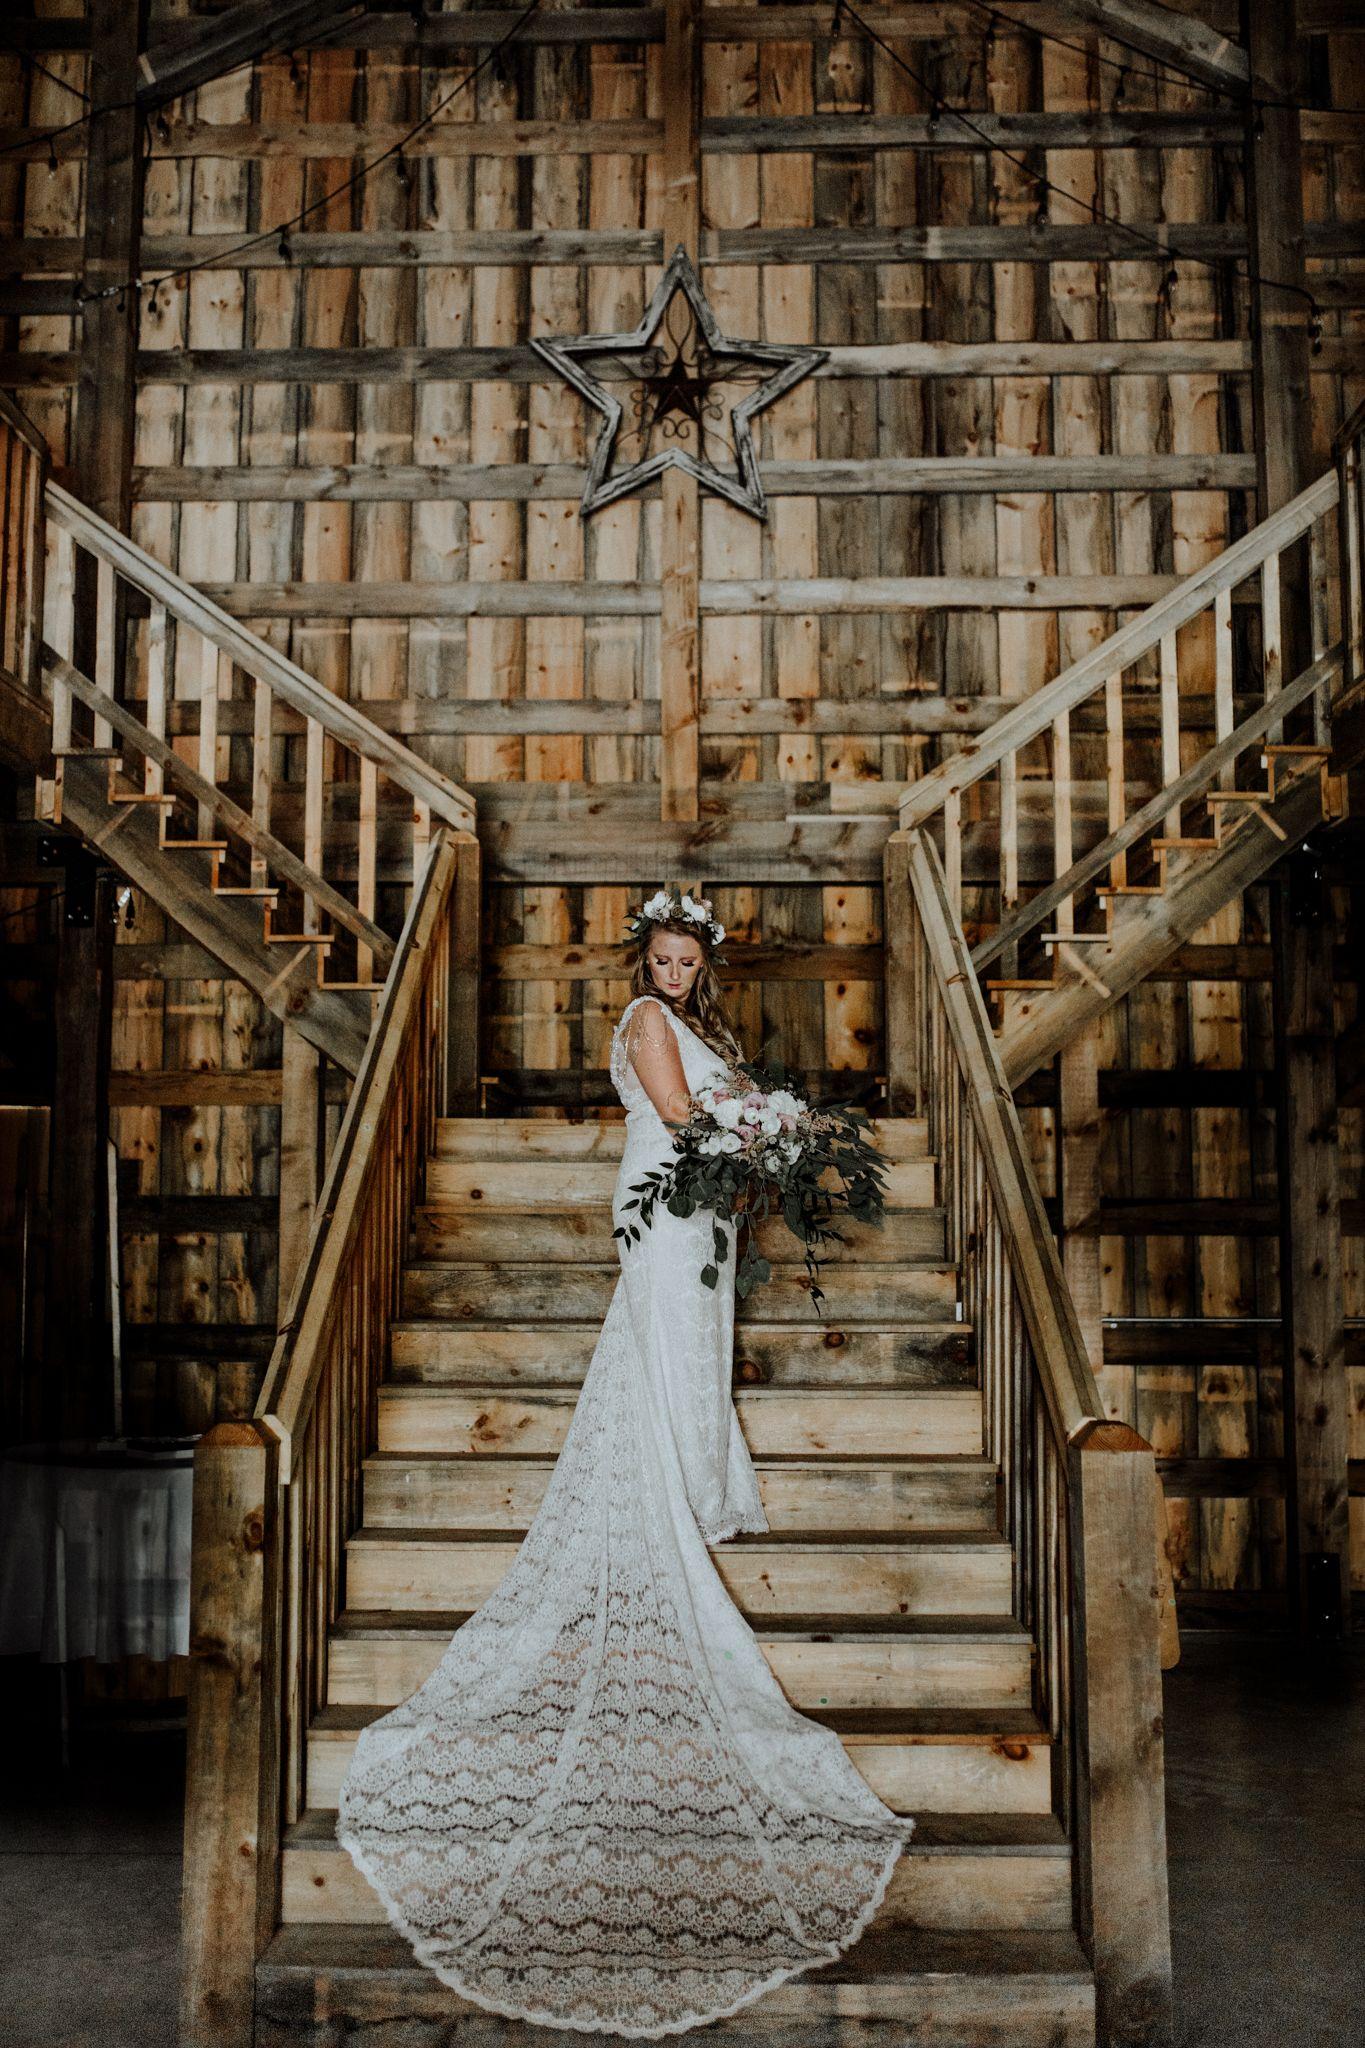 Barn Wedding Venue in Michigan Photo by Little Blue Bird ...